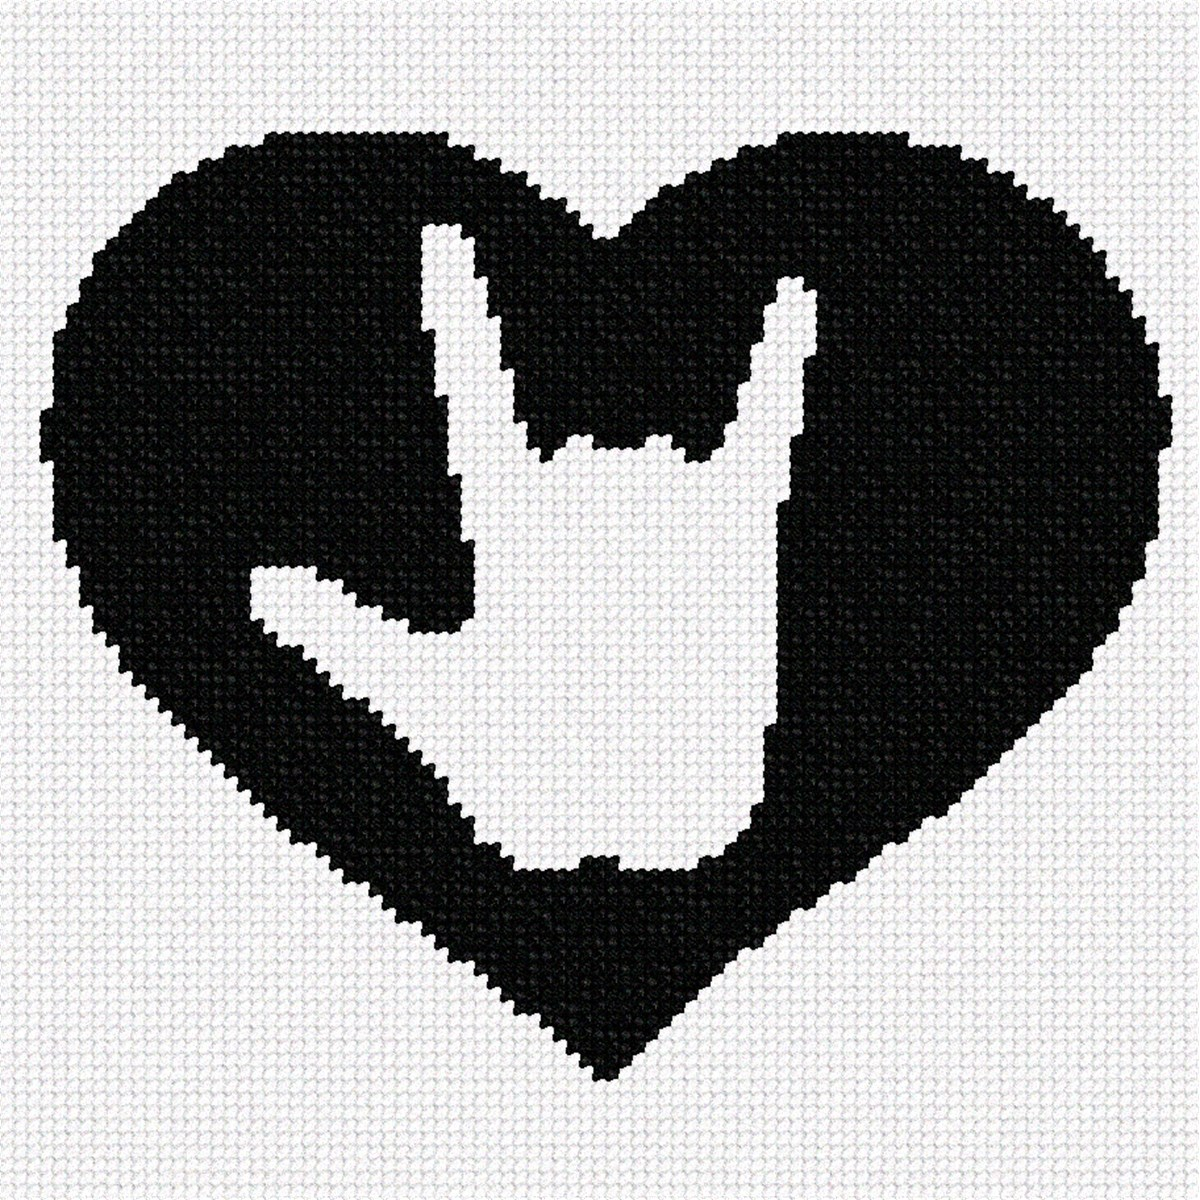 Needlepoint Canvas Asl I Love You